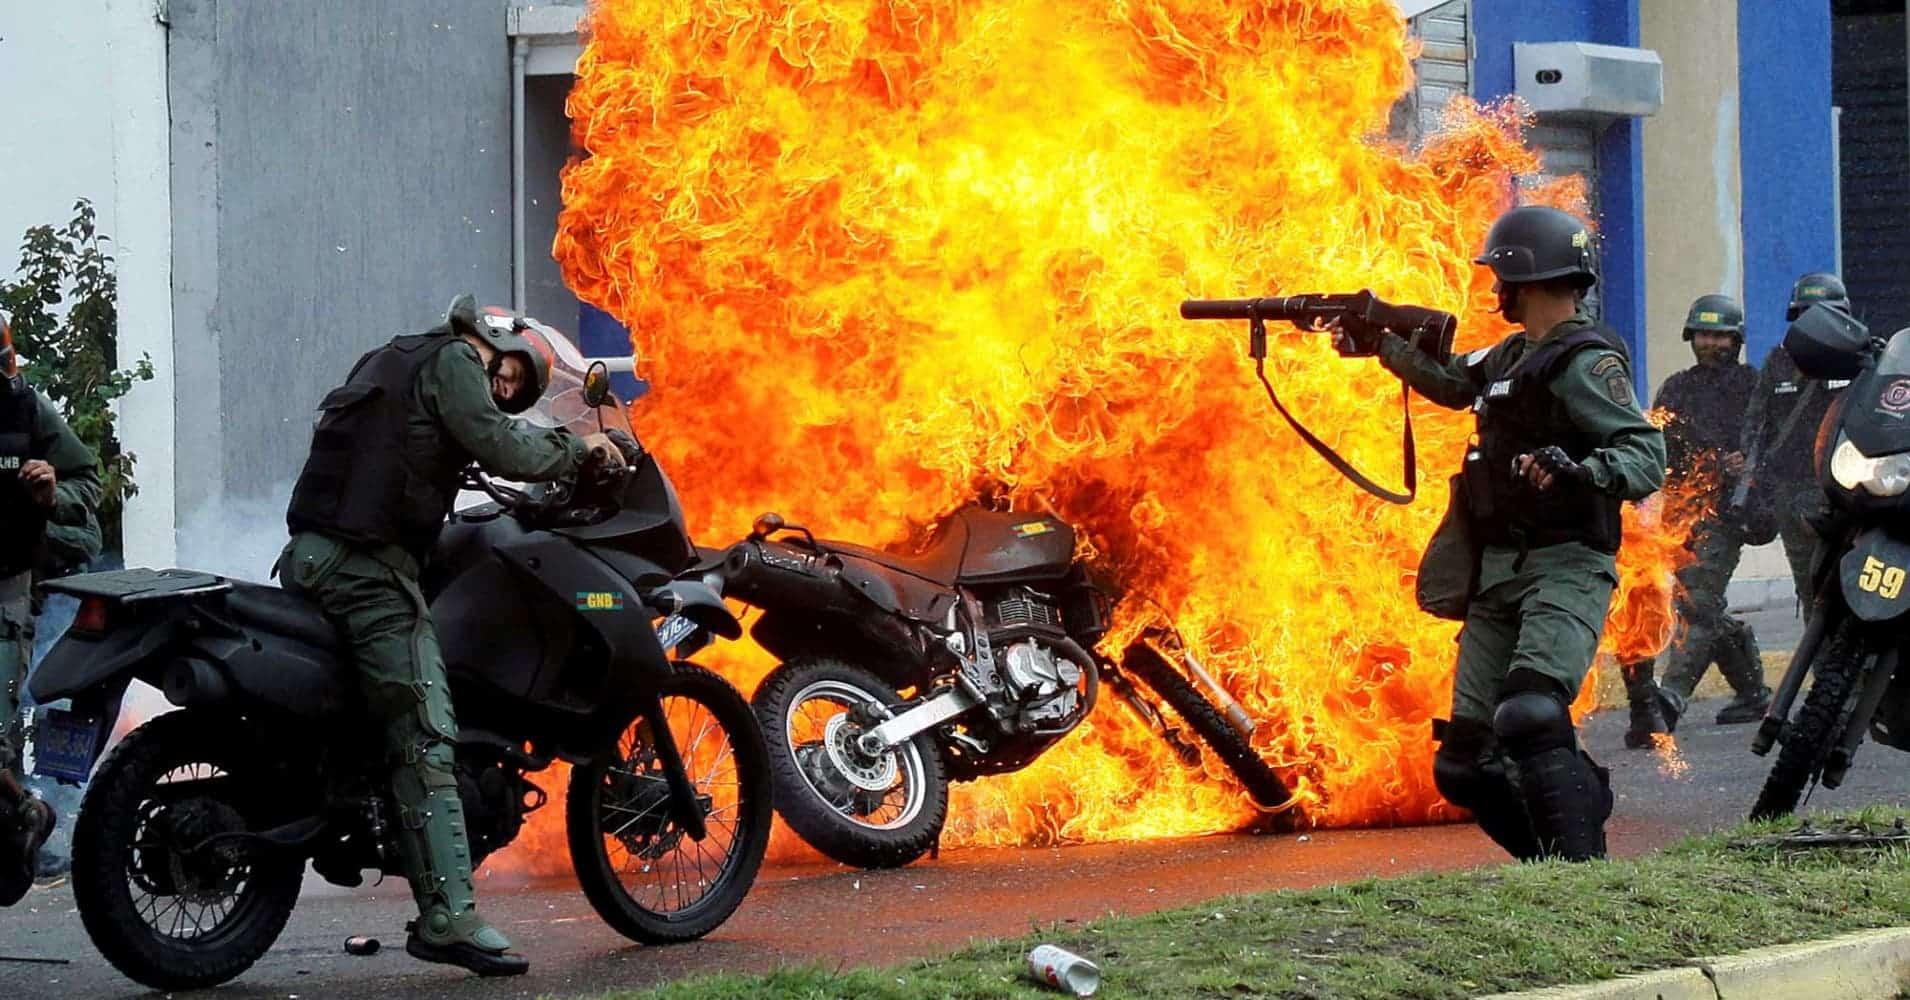 Heavy Clashes In Caracas, Venezuela As Criminal Gangs Try To Spread (VIDEOS)